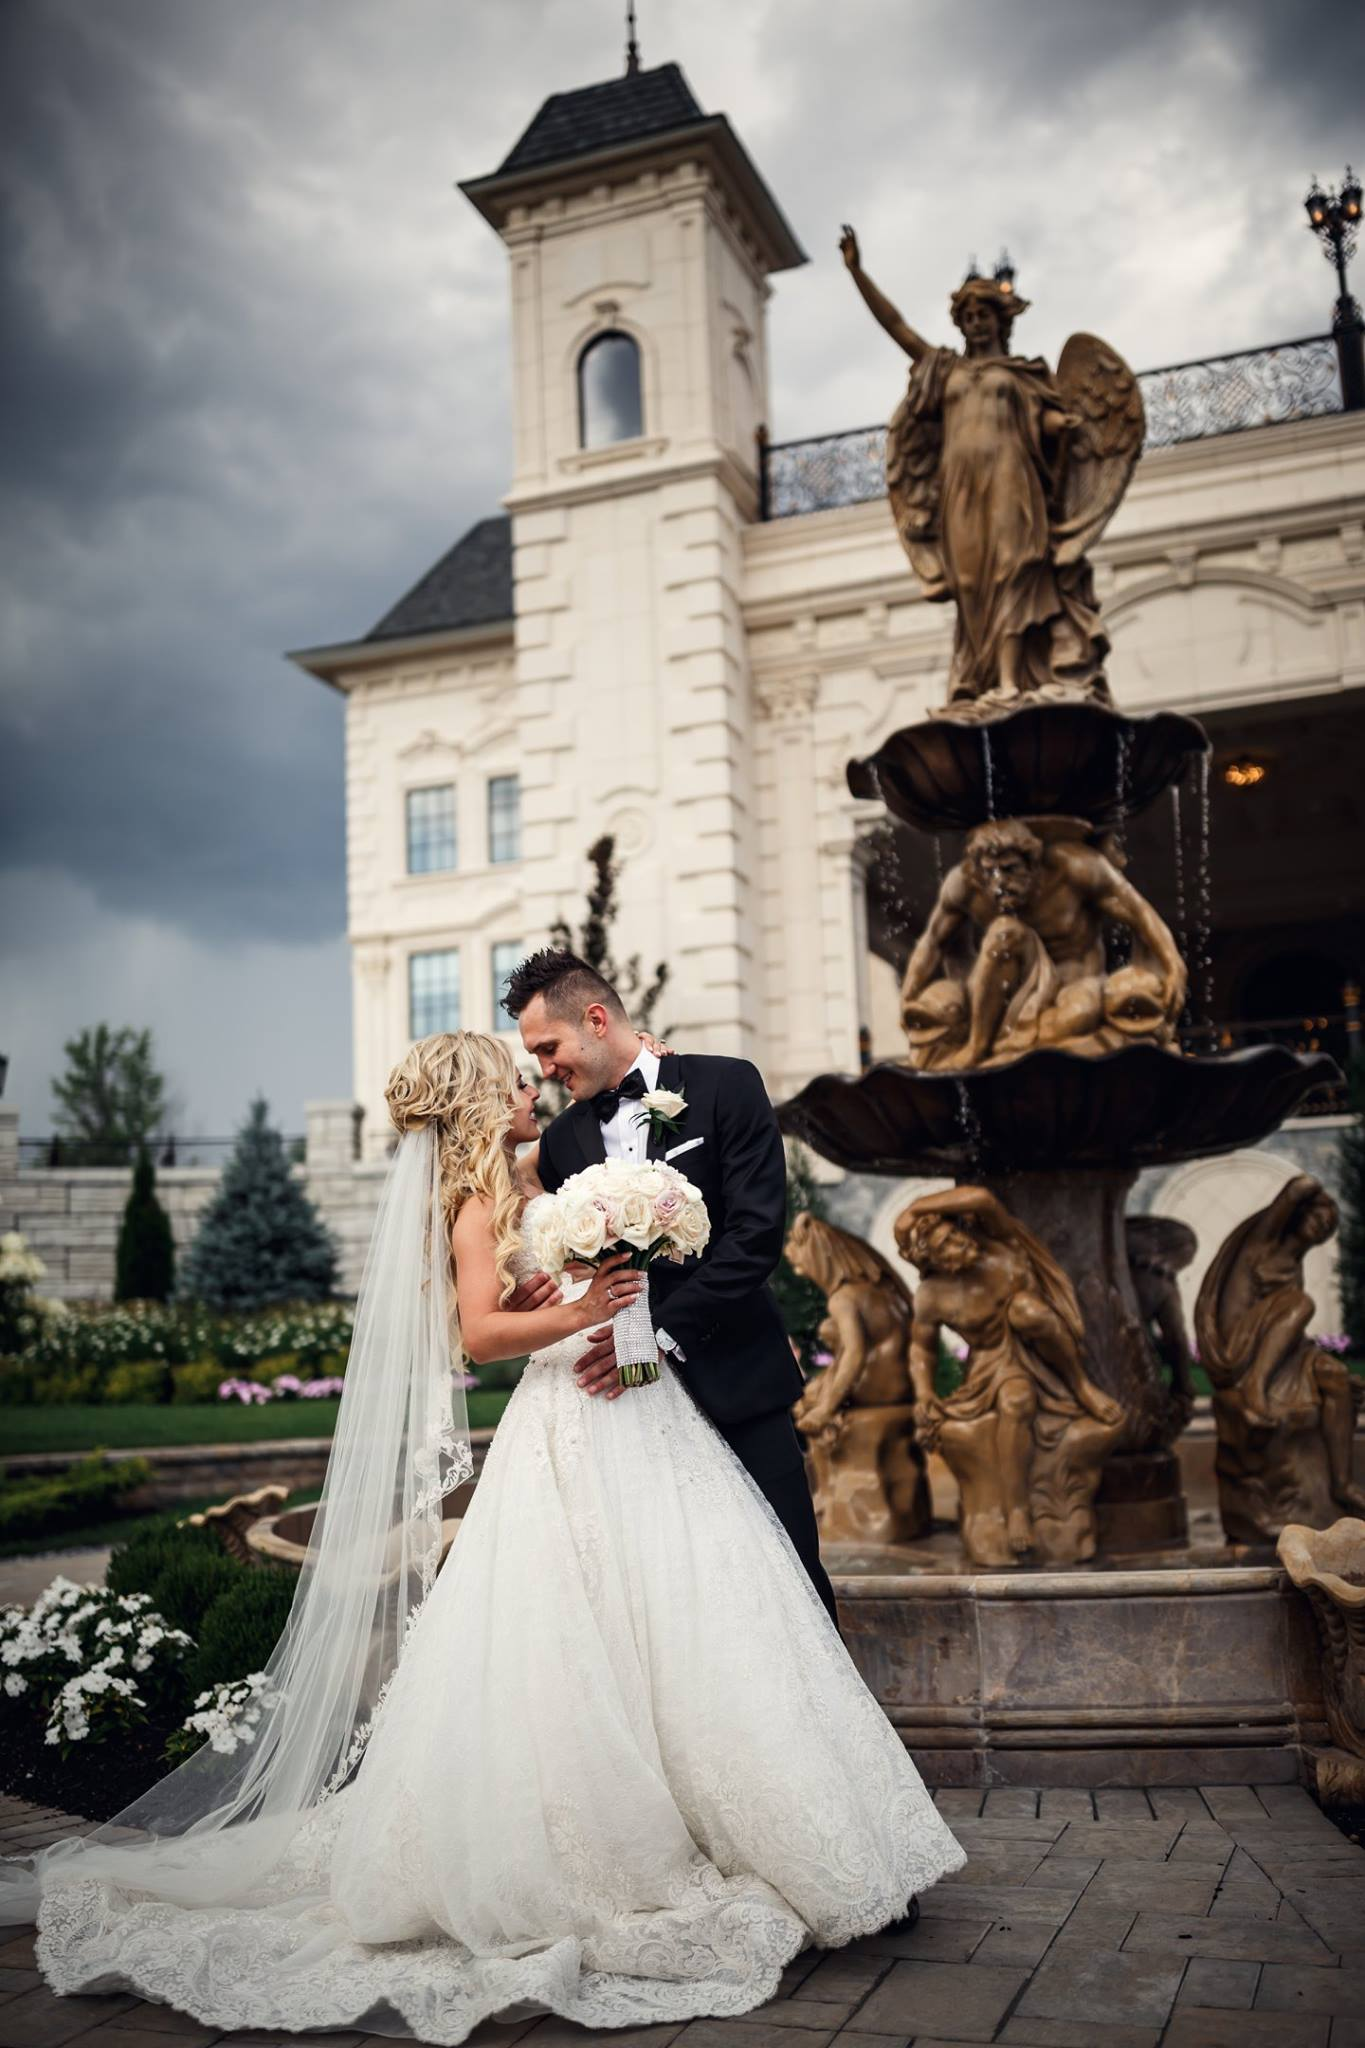 zajac photography wed26a